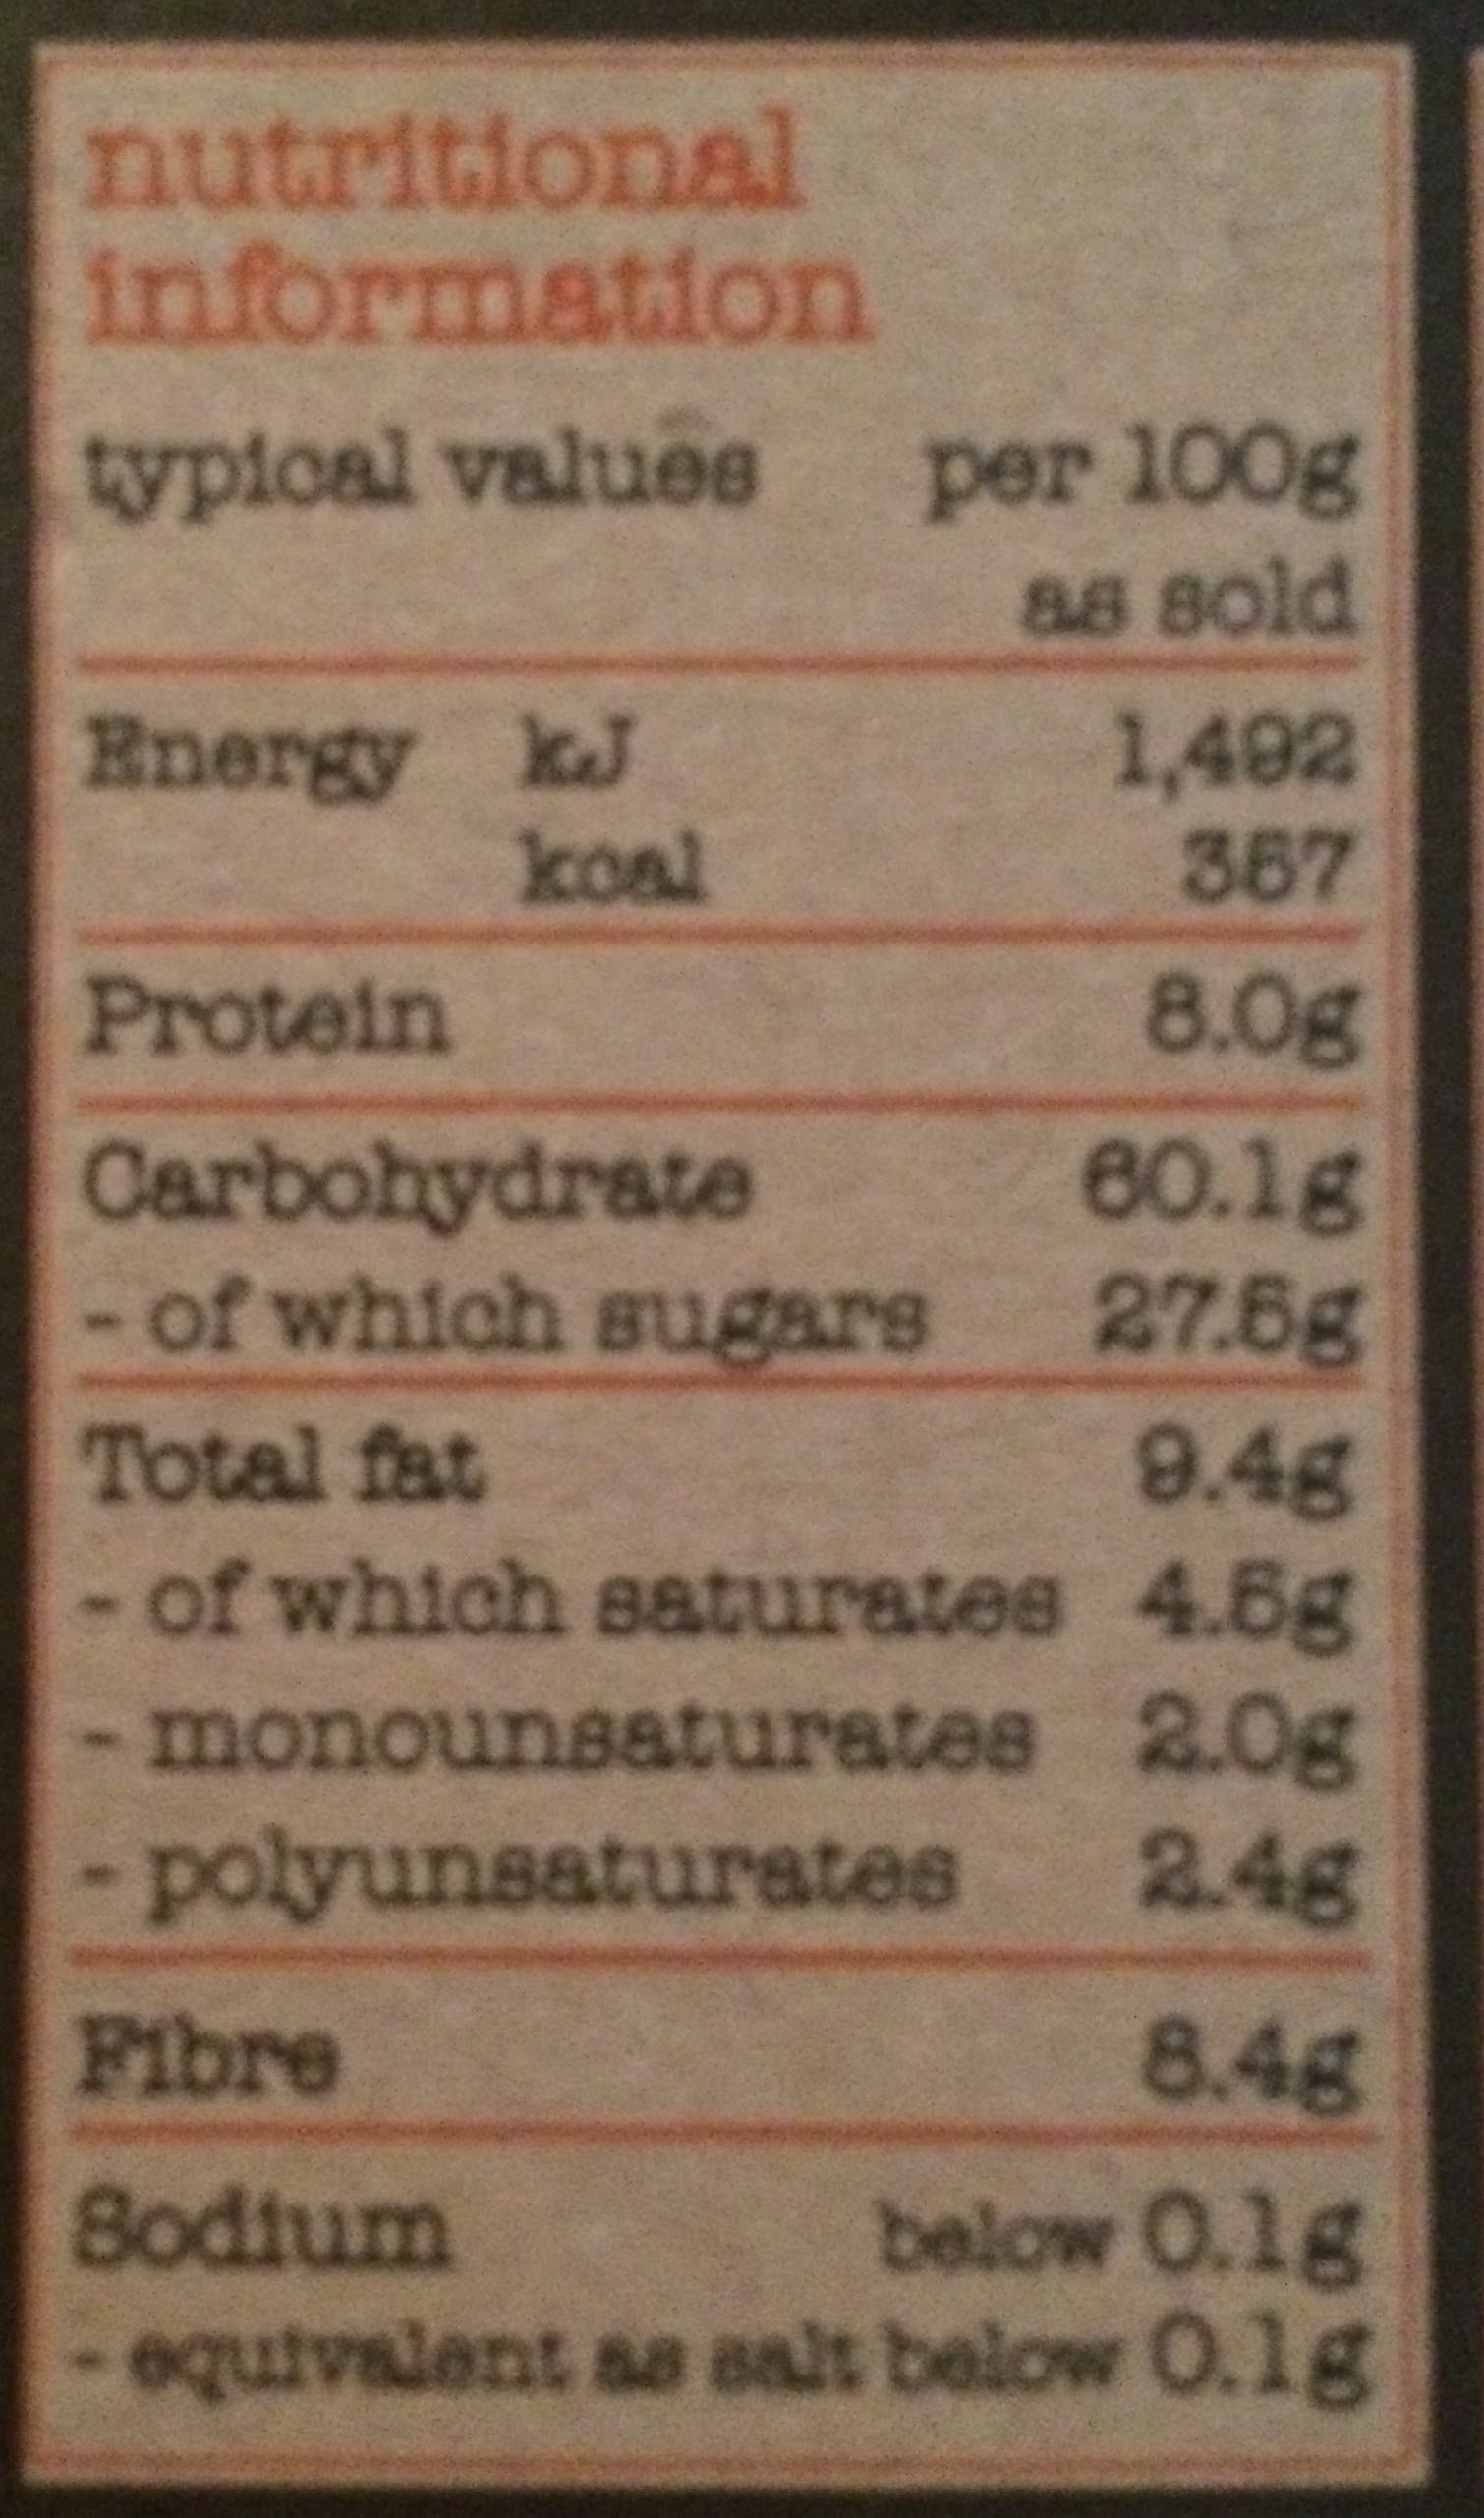 Dorset cereals fabulous high fibre - Nutrition facts